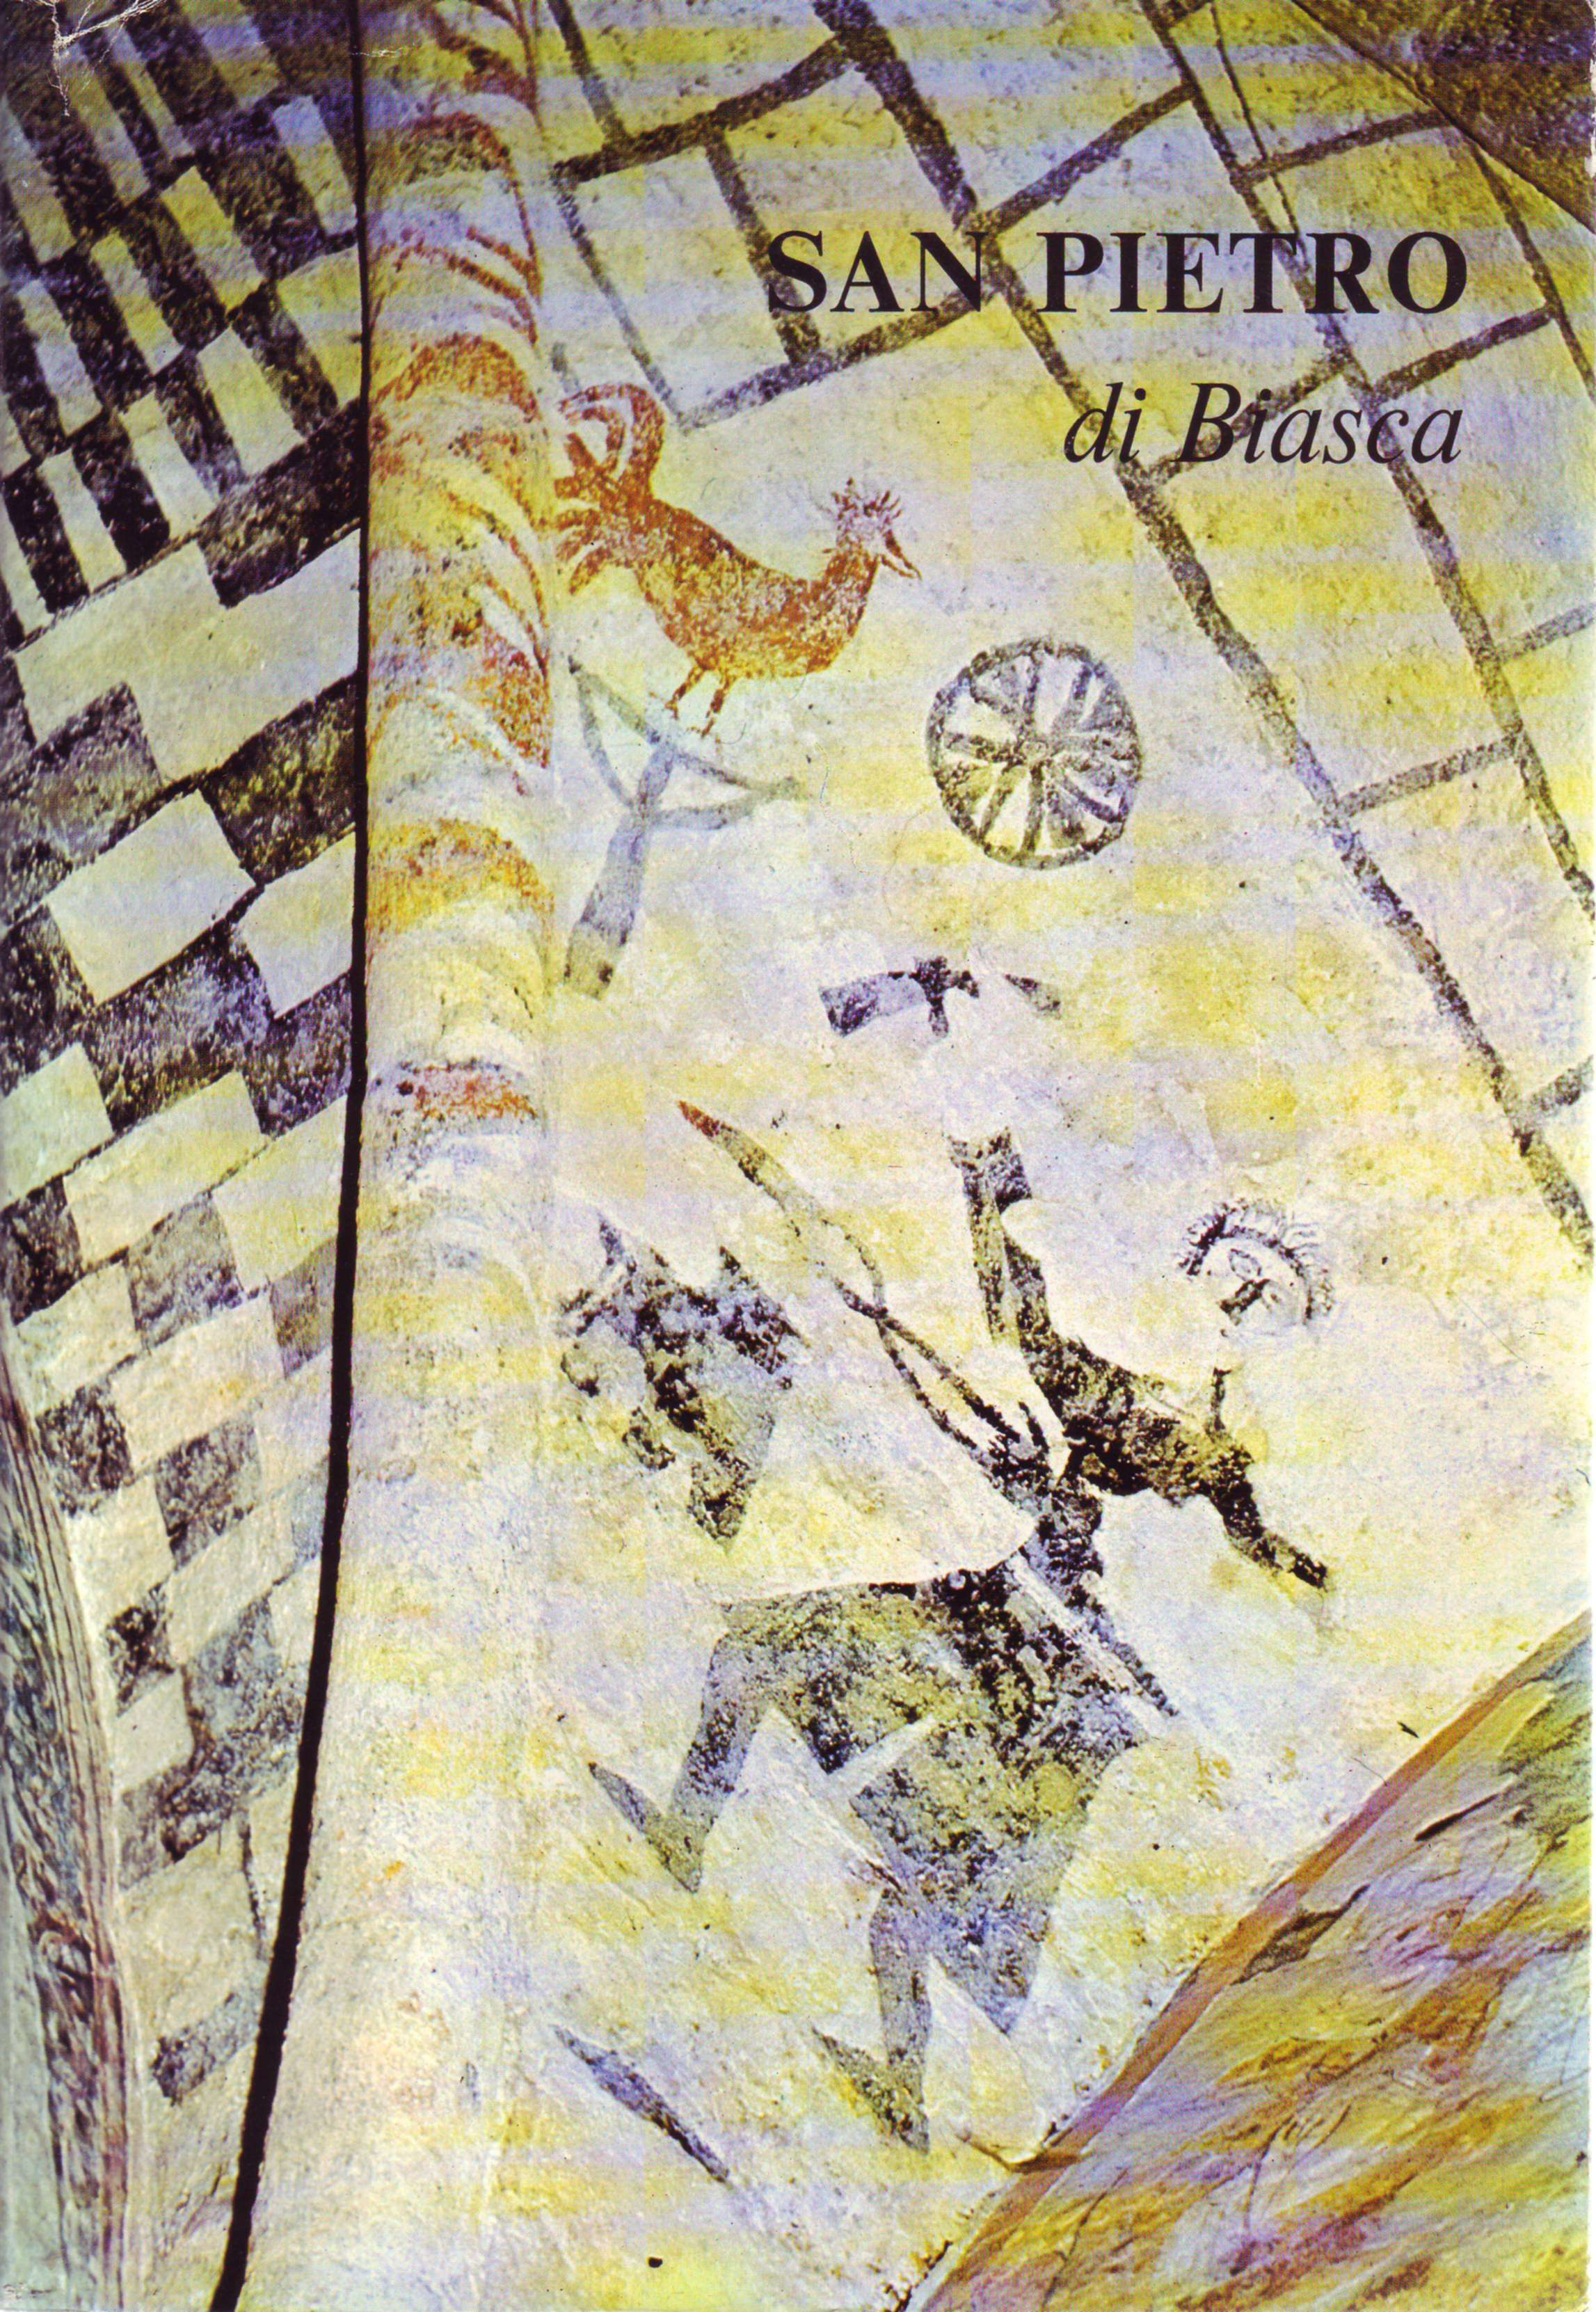 San Pietro di Biasca